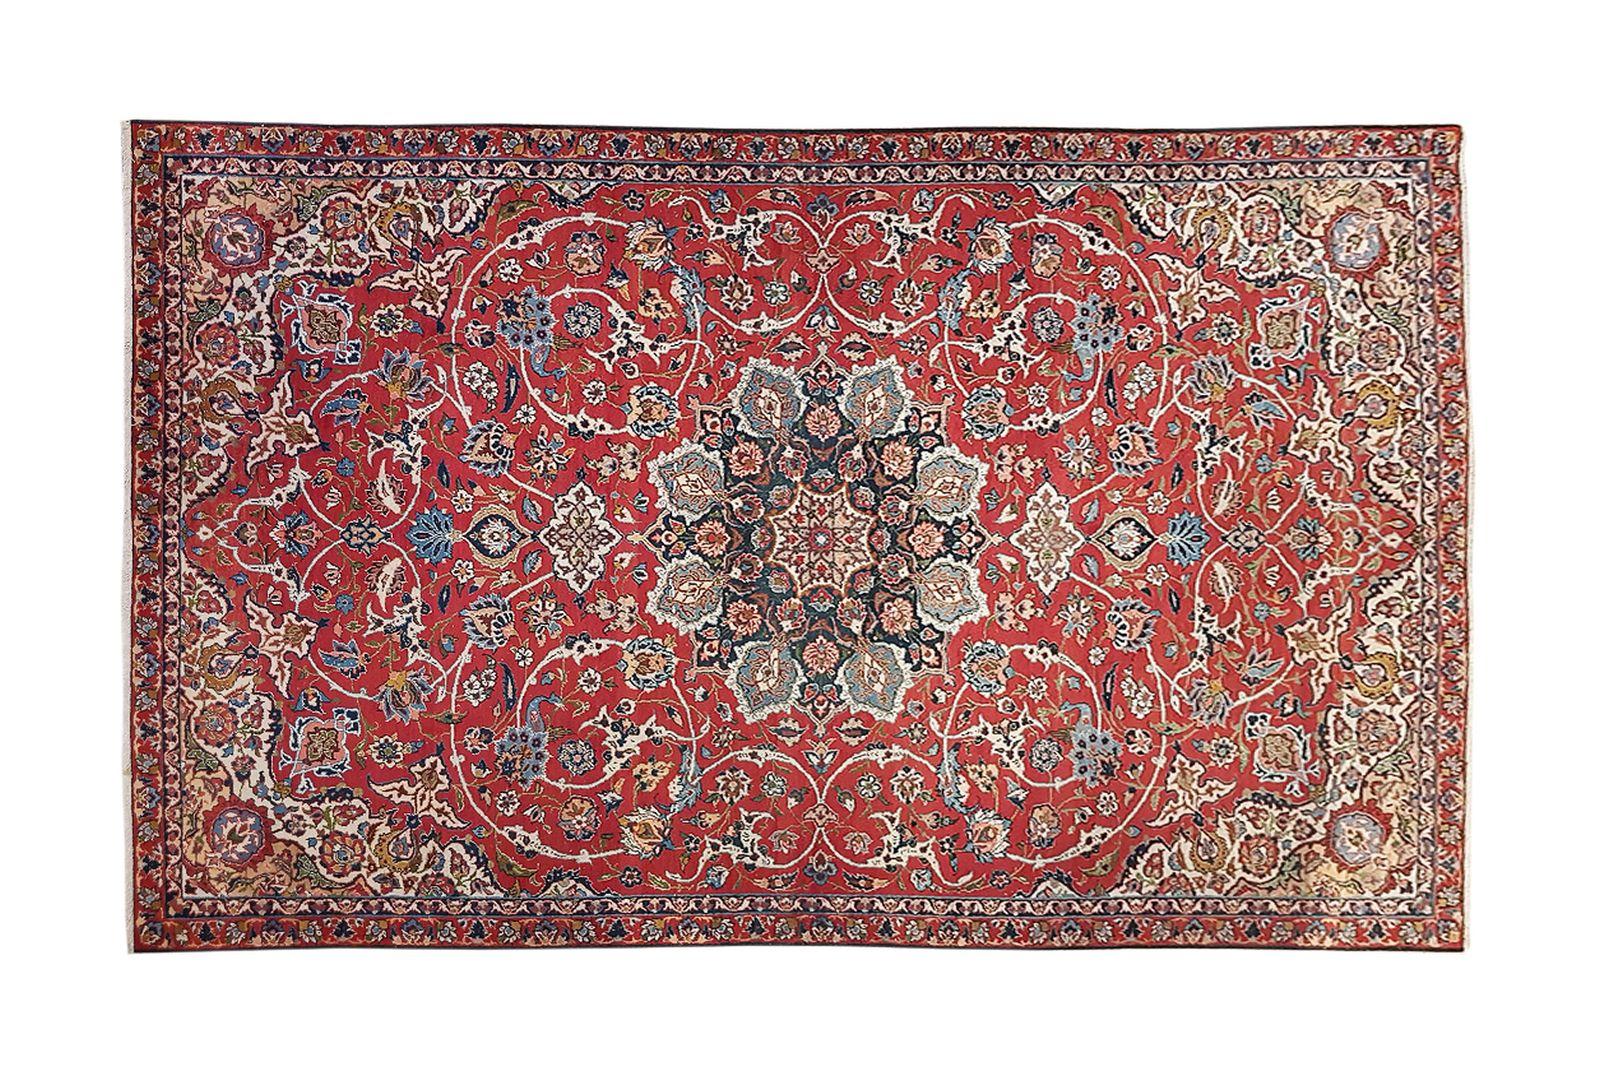 #188 Isfahan wool carpet, 1920-1930 | Isfahan Woll-Teppich, 1920-1930 Image